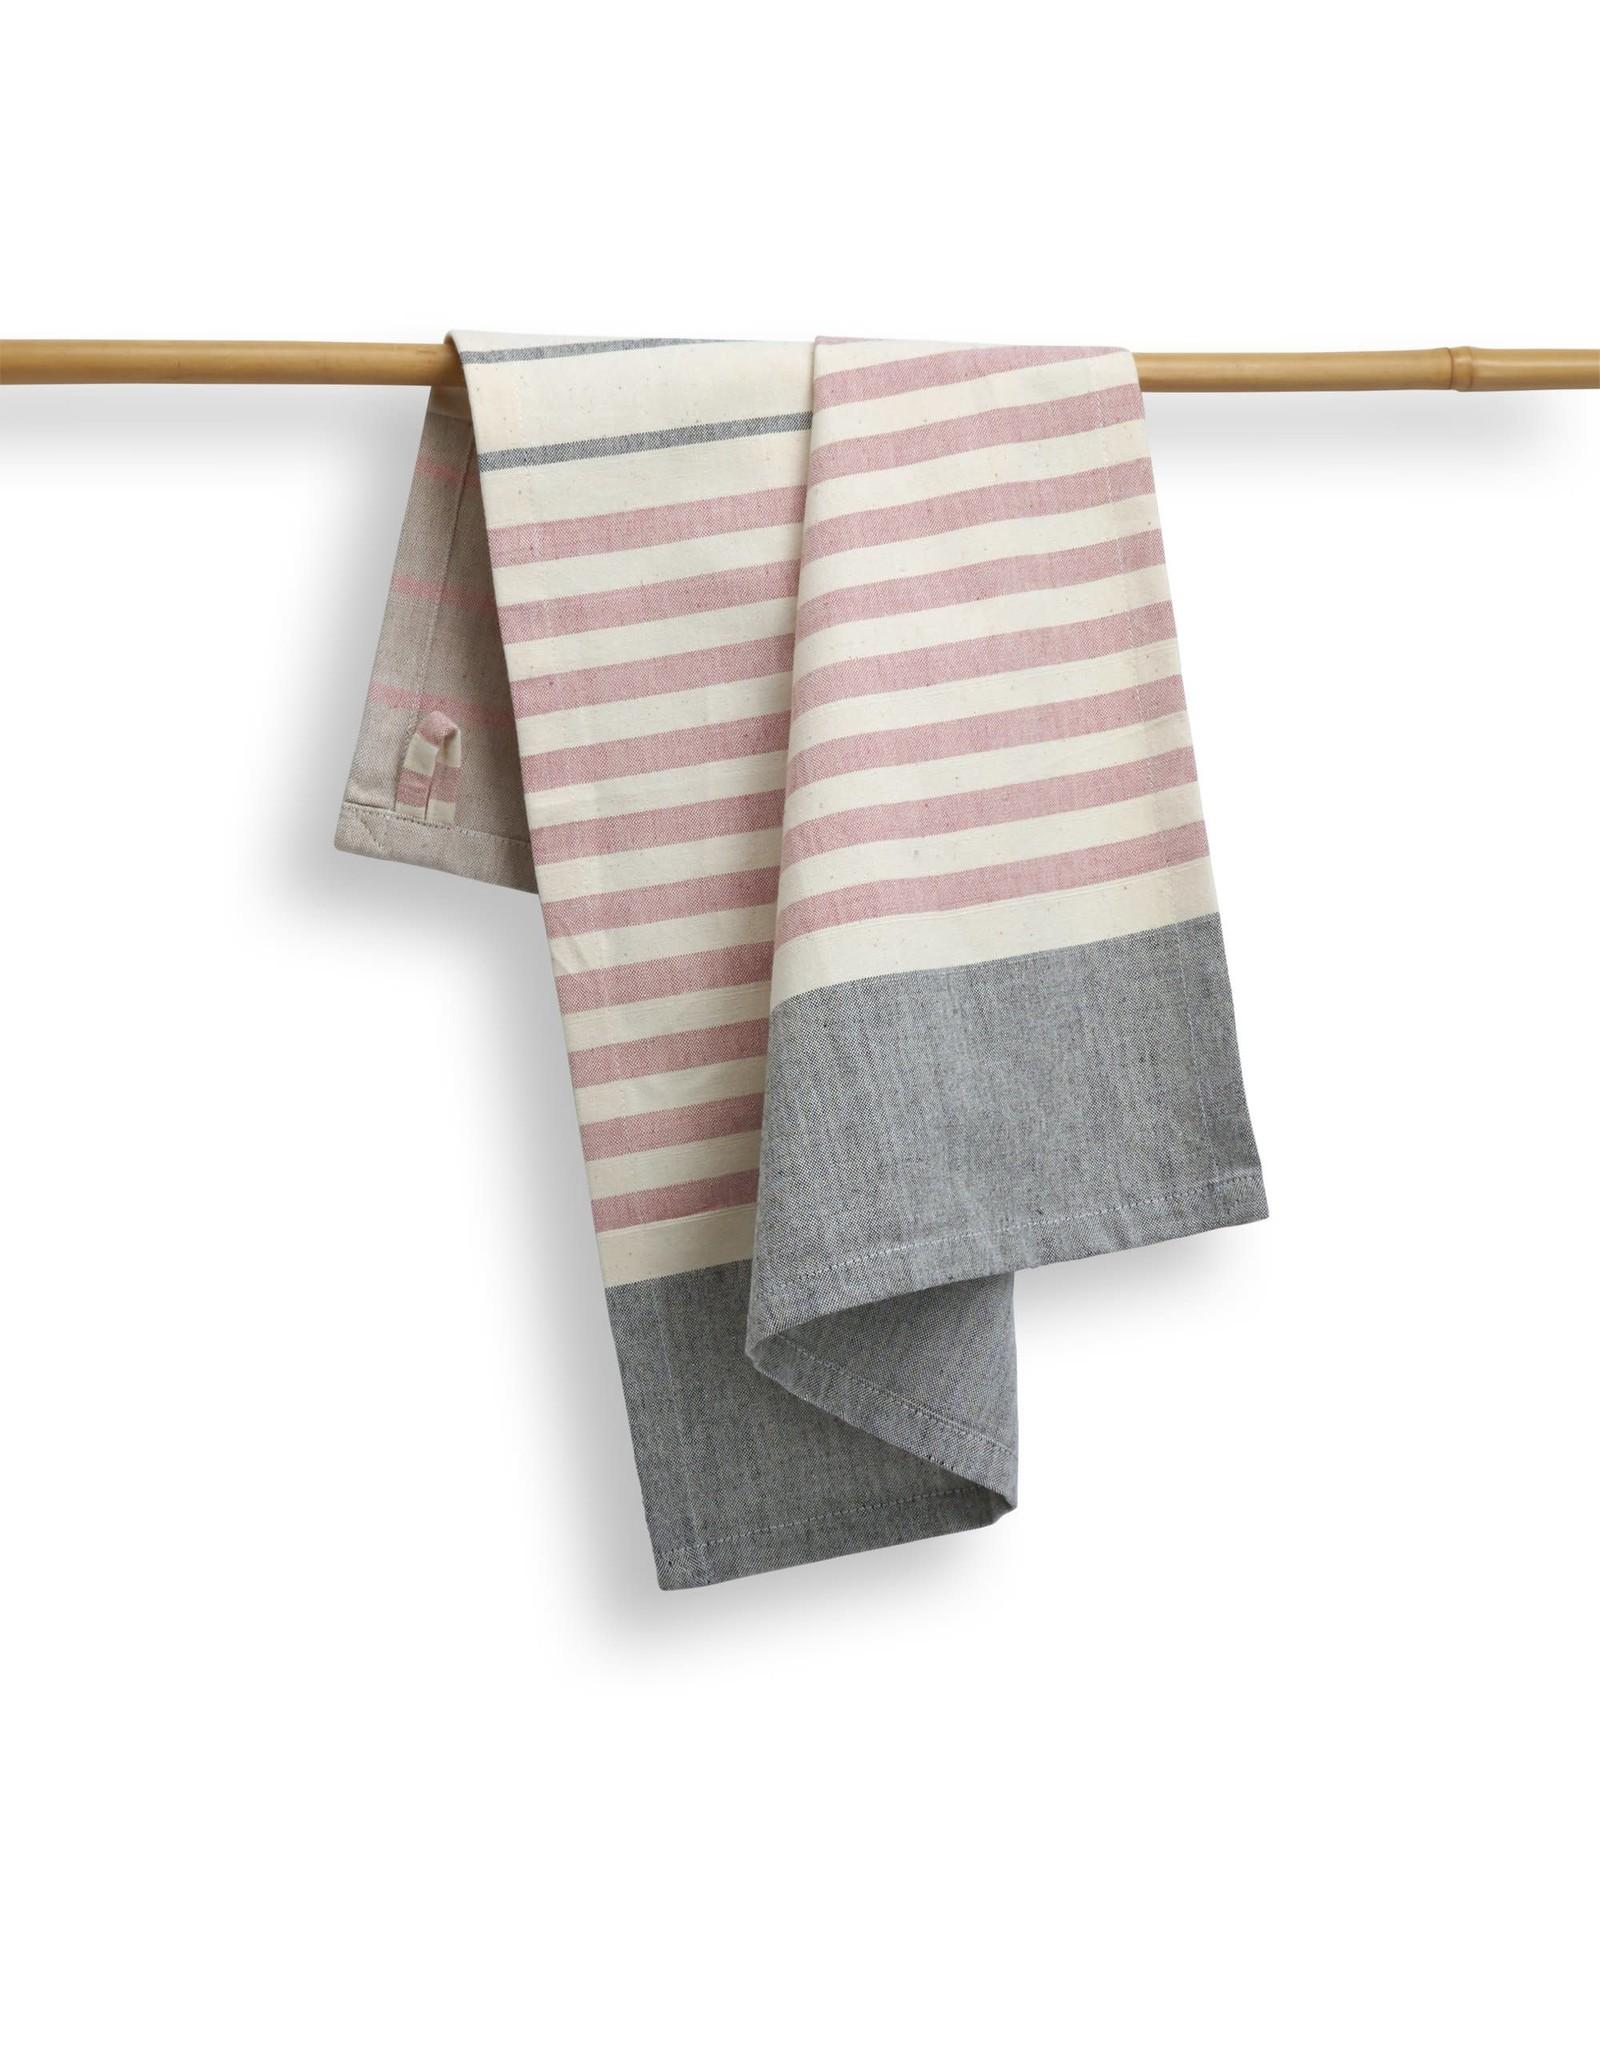 27 x 19 Cotton Handwoven Kitchen Towel, Peppercorn, India